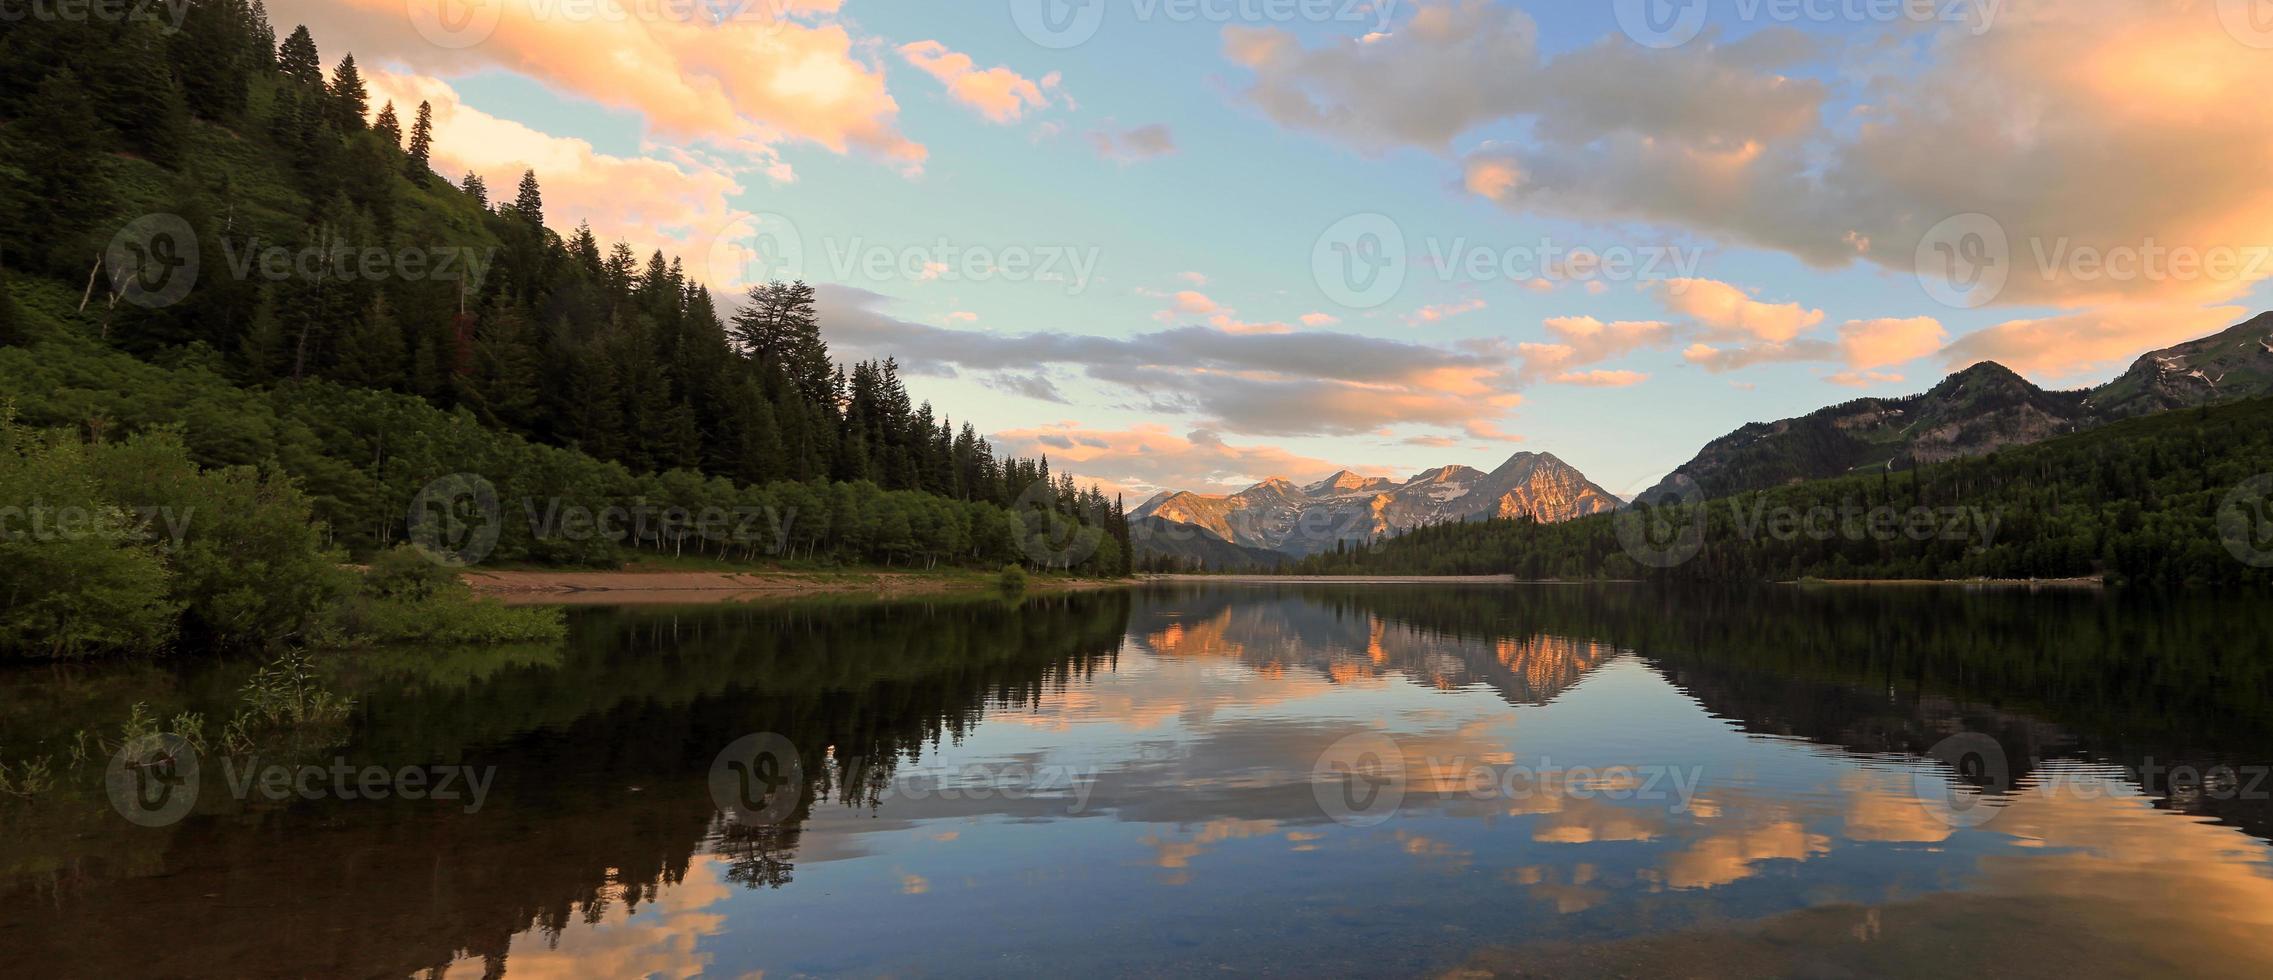 pôr do sol no lago prateado foto